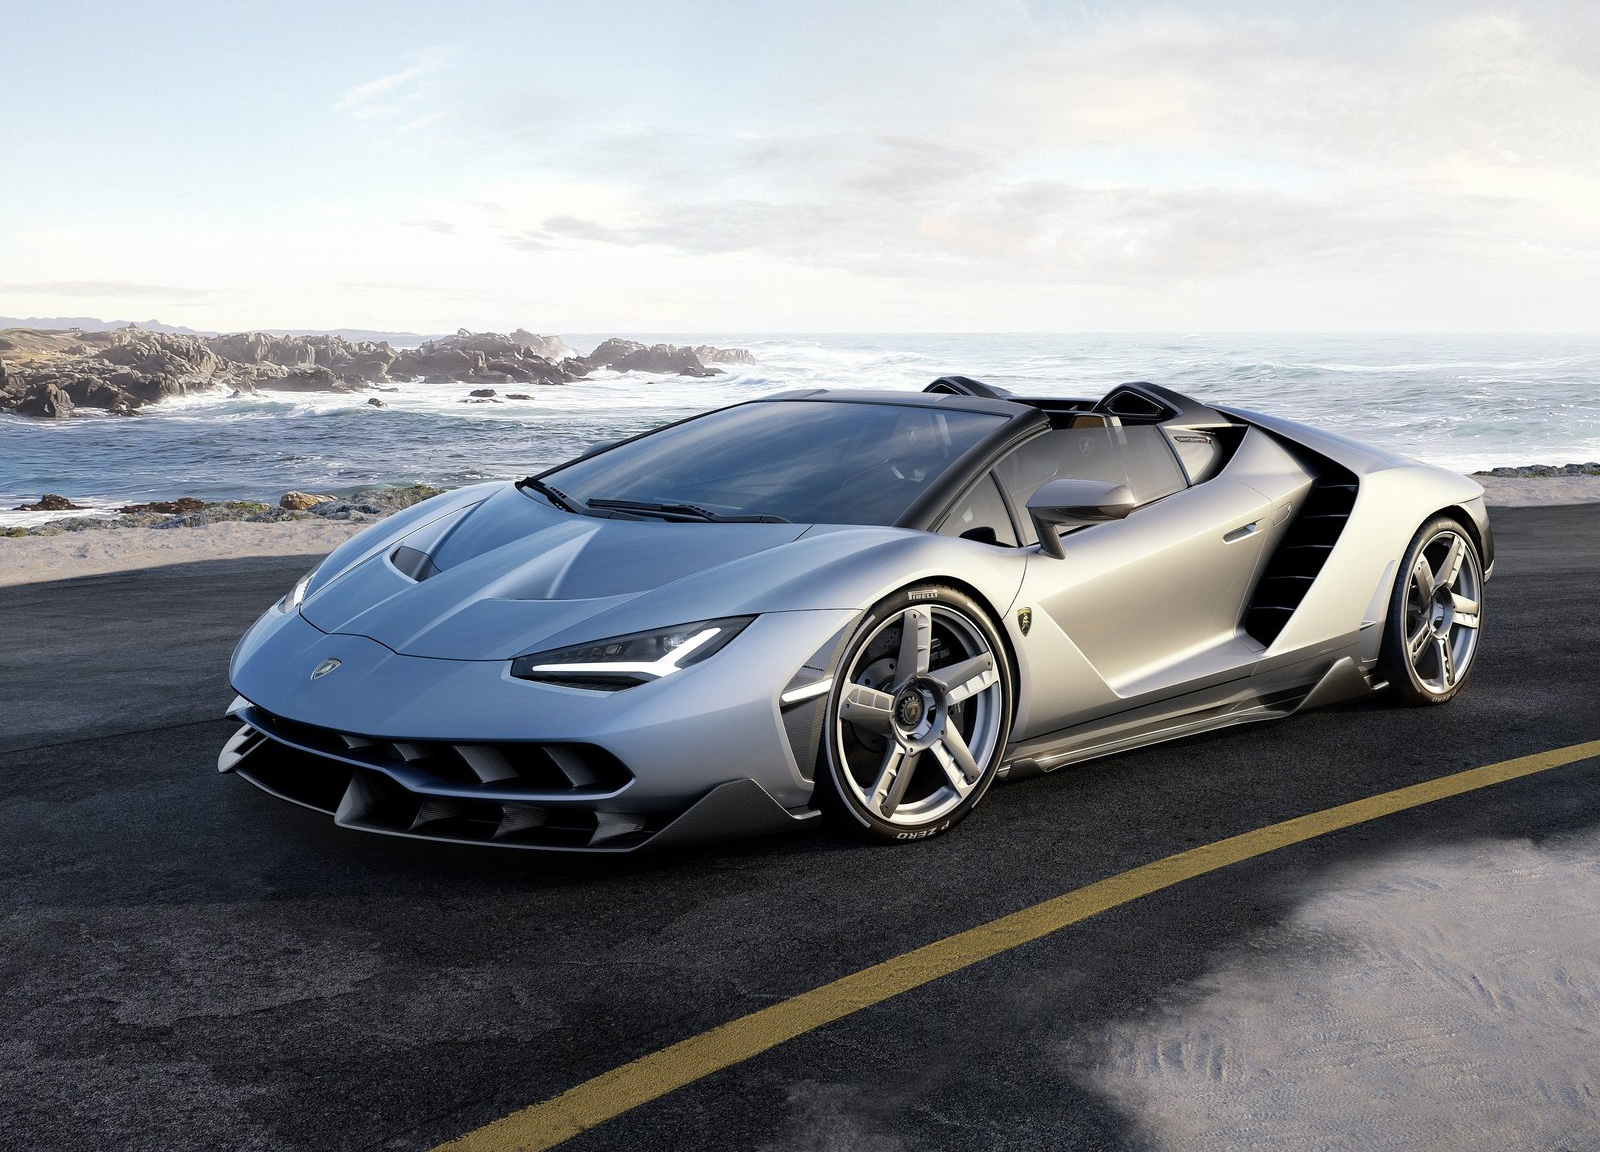 2016 Pebble Beach - Lamborghini Centenario Roadster